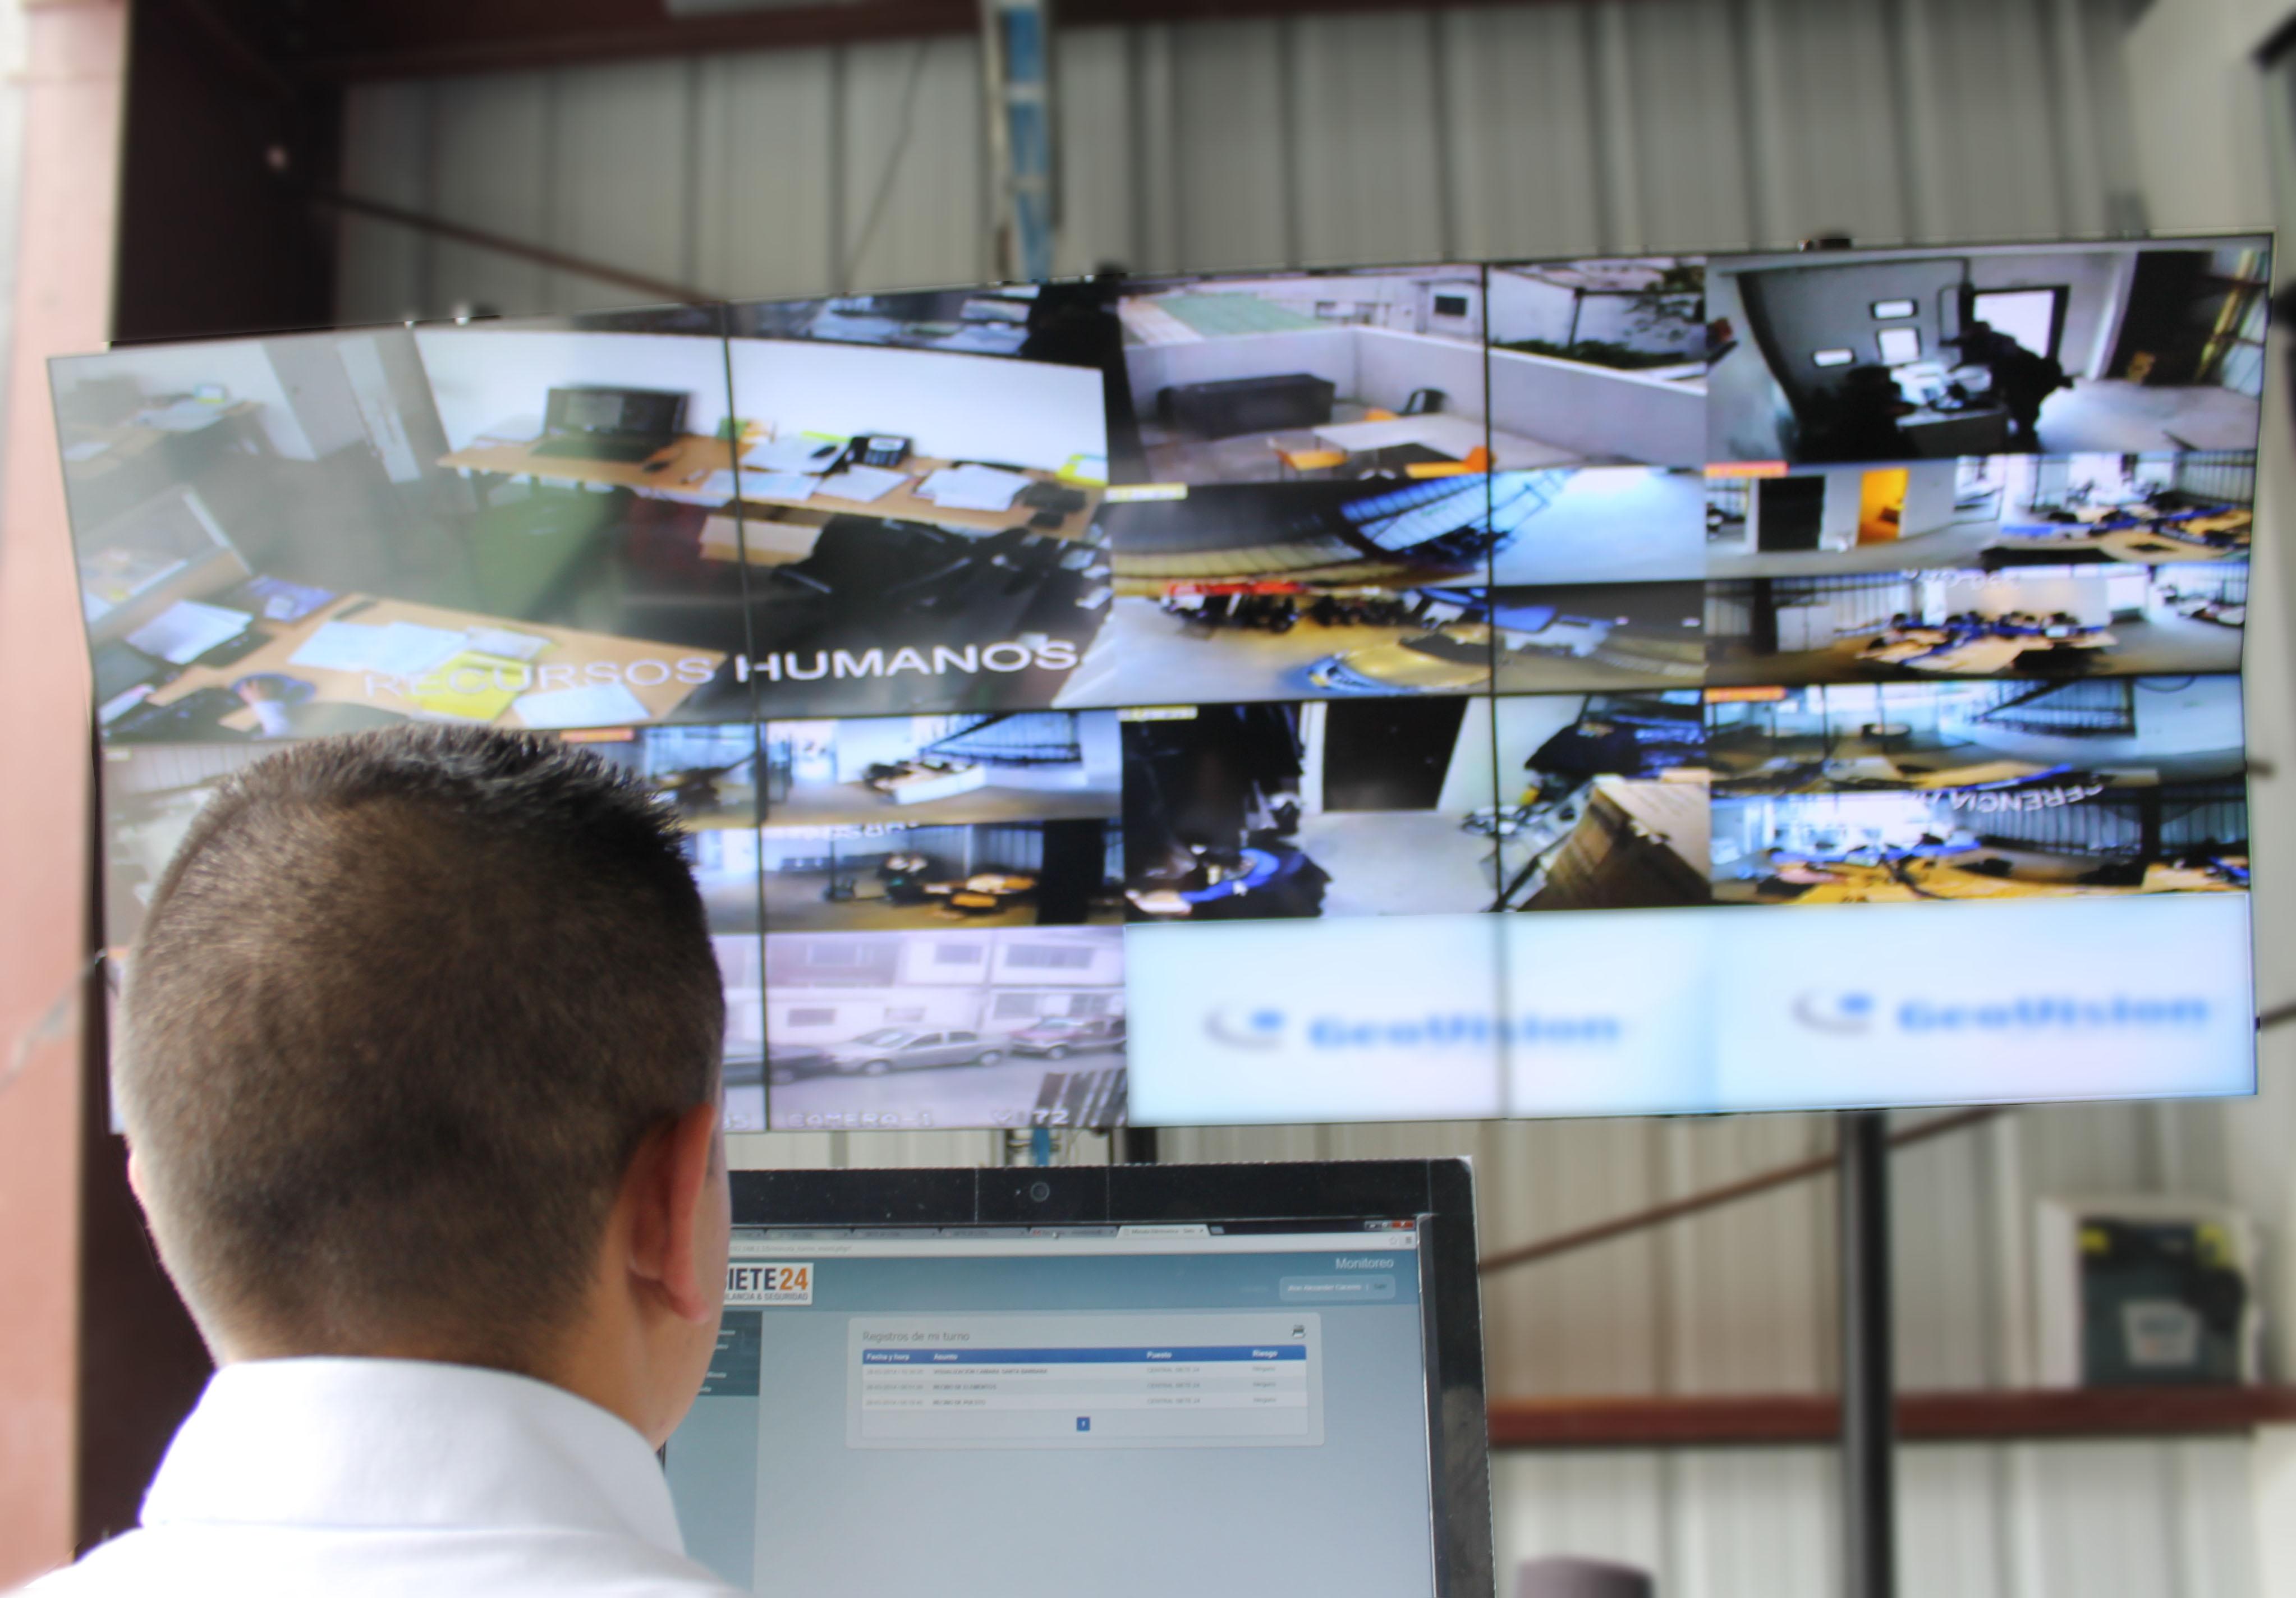 Como elegir un buen sistema de videovigilancia integralti - Sistemas de videovigilancia ...